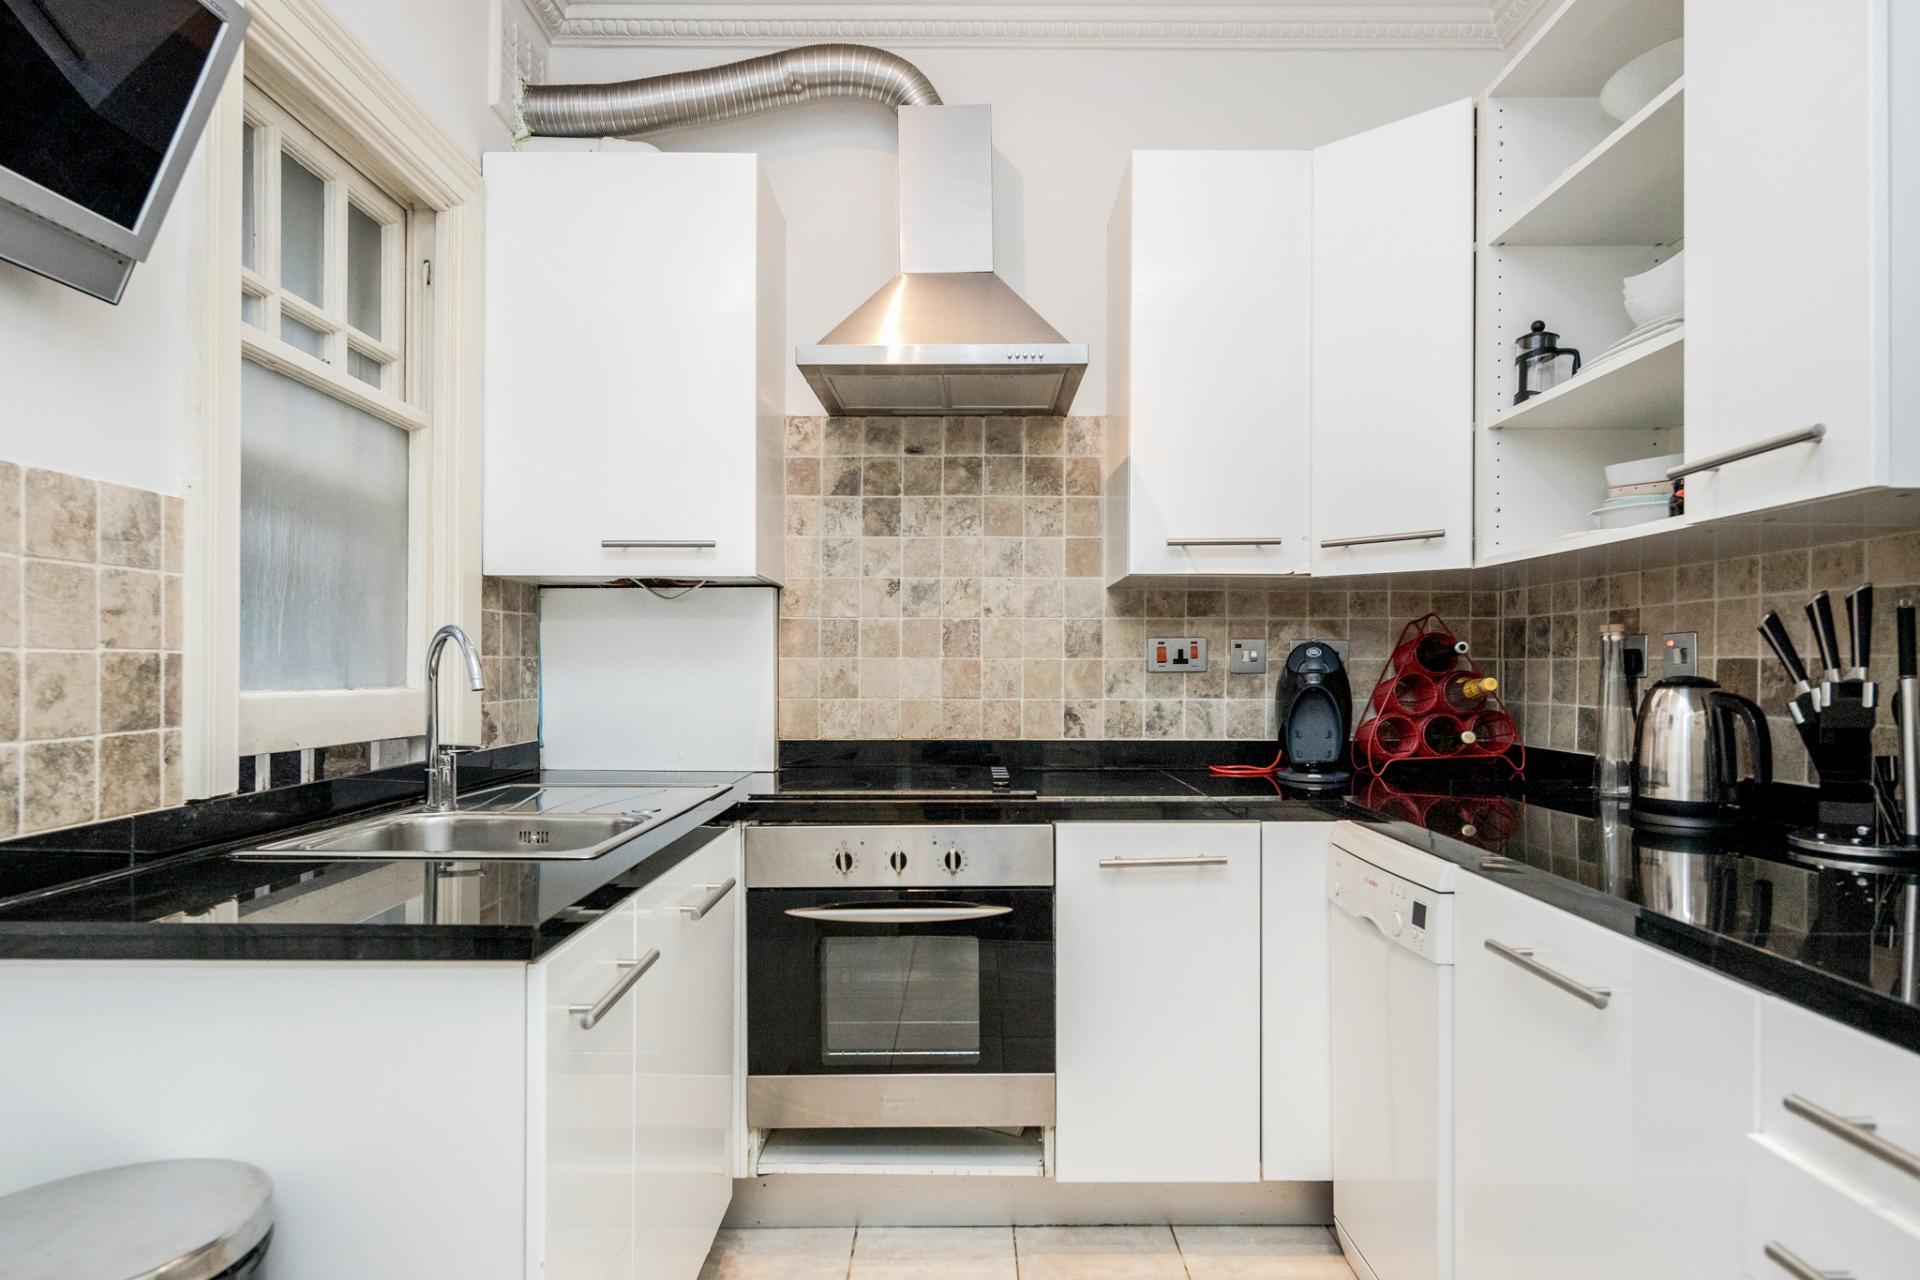 Kitchen at Kensington High Street, Kensington, London - Citybase Apartments